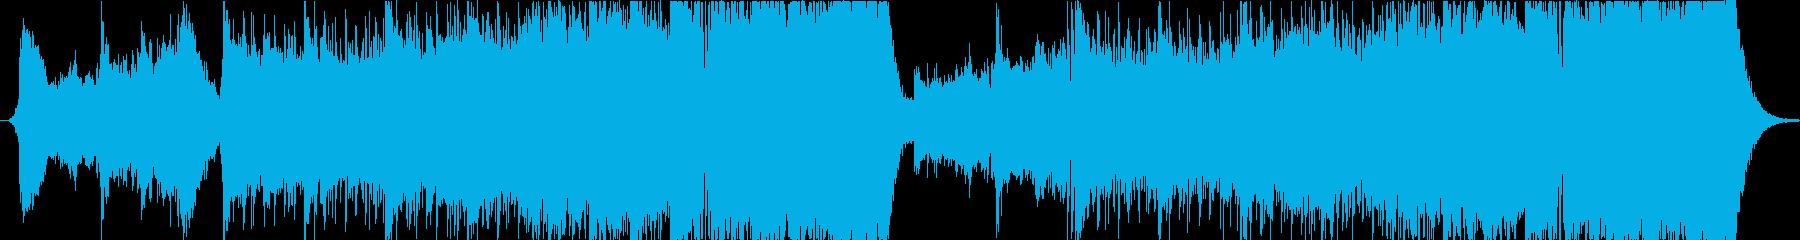 Dubstep Action Musicの再生済みの波形